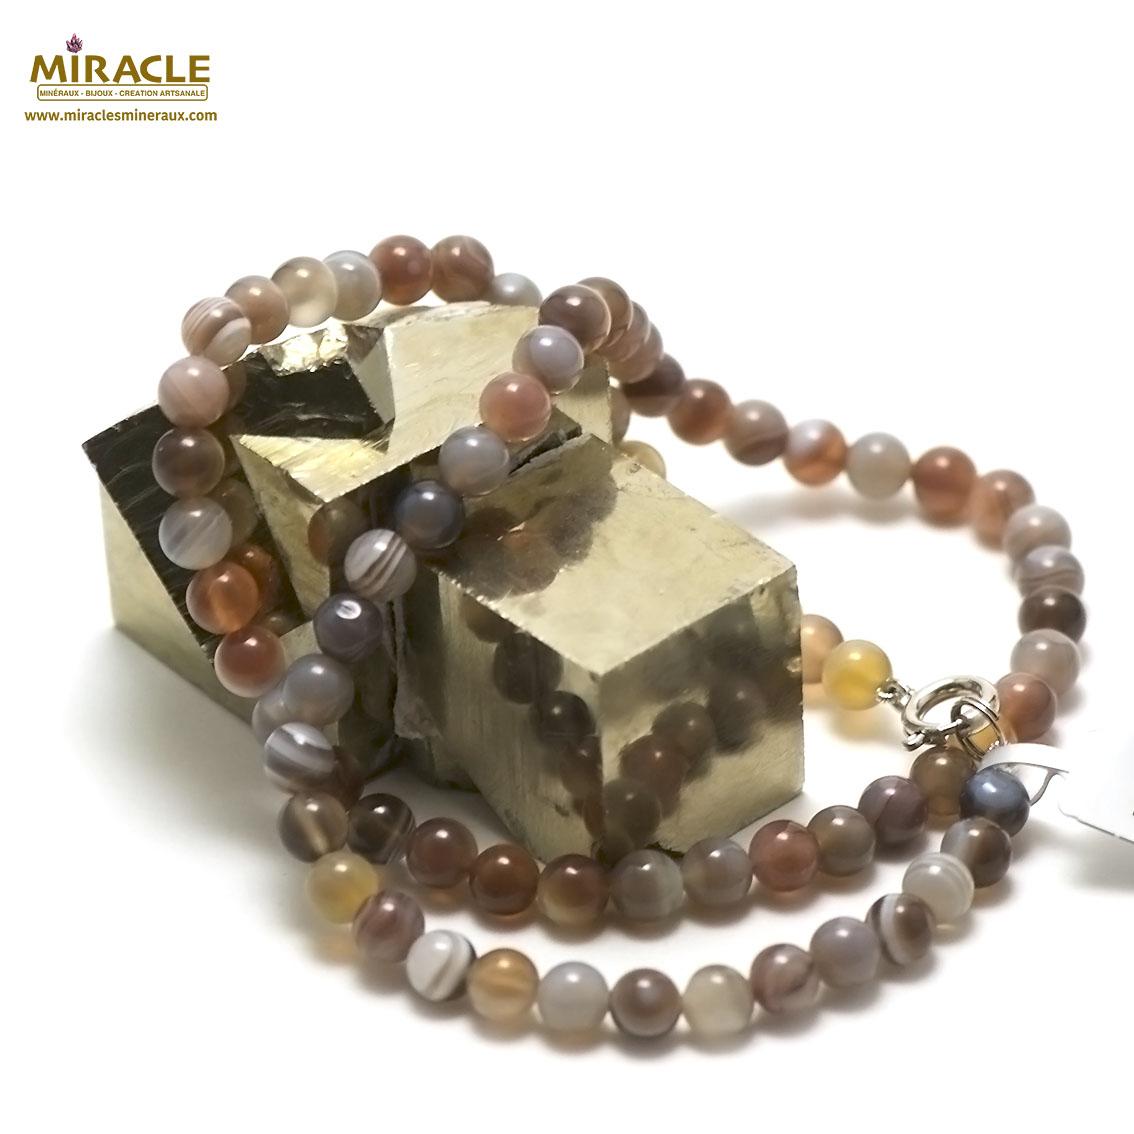 collier agate de botswana perle ronde 6mm